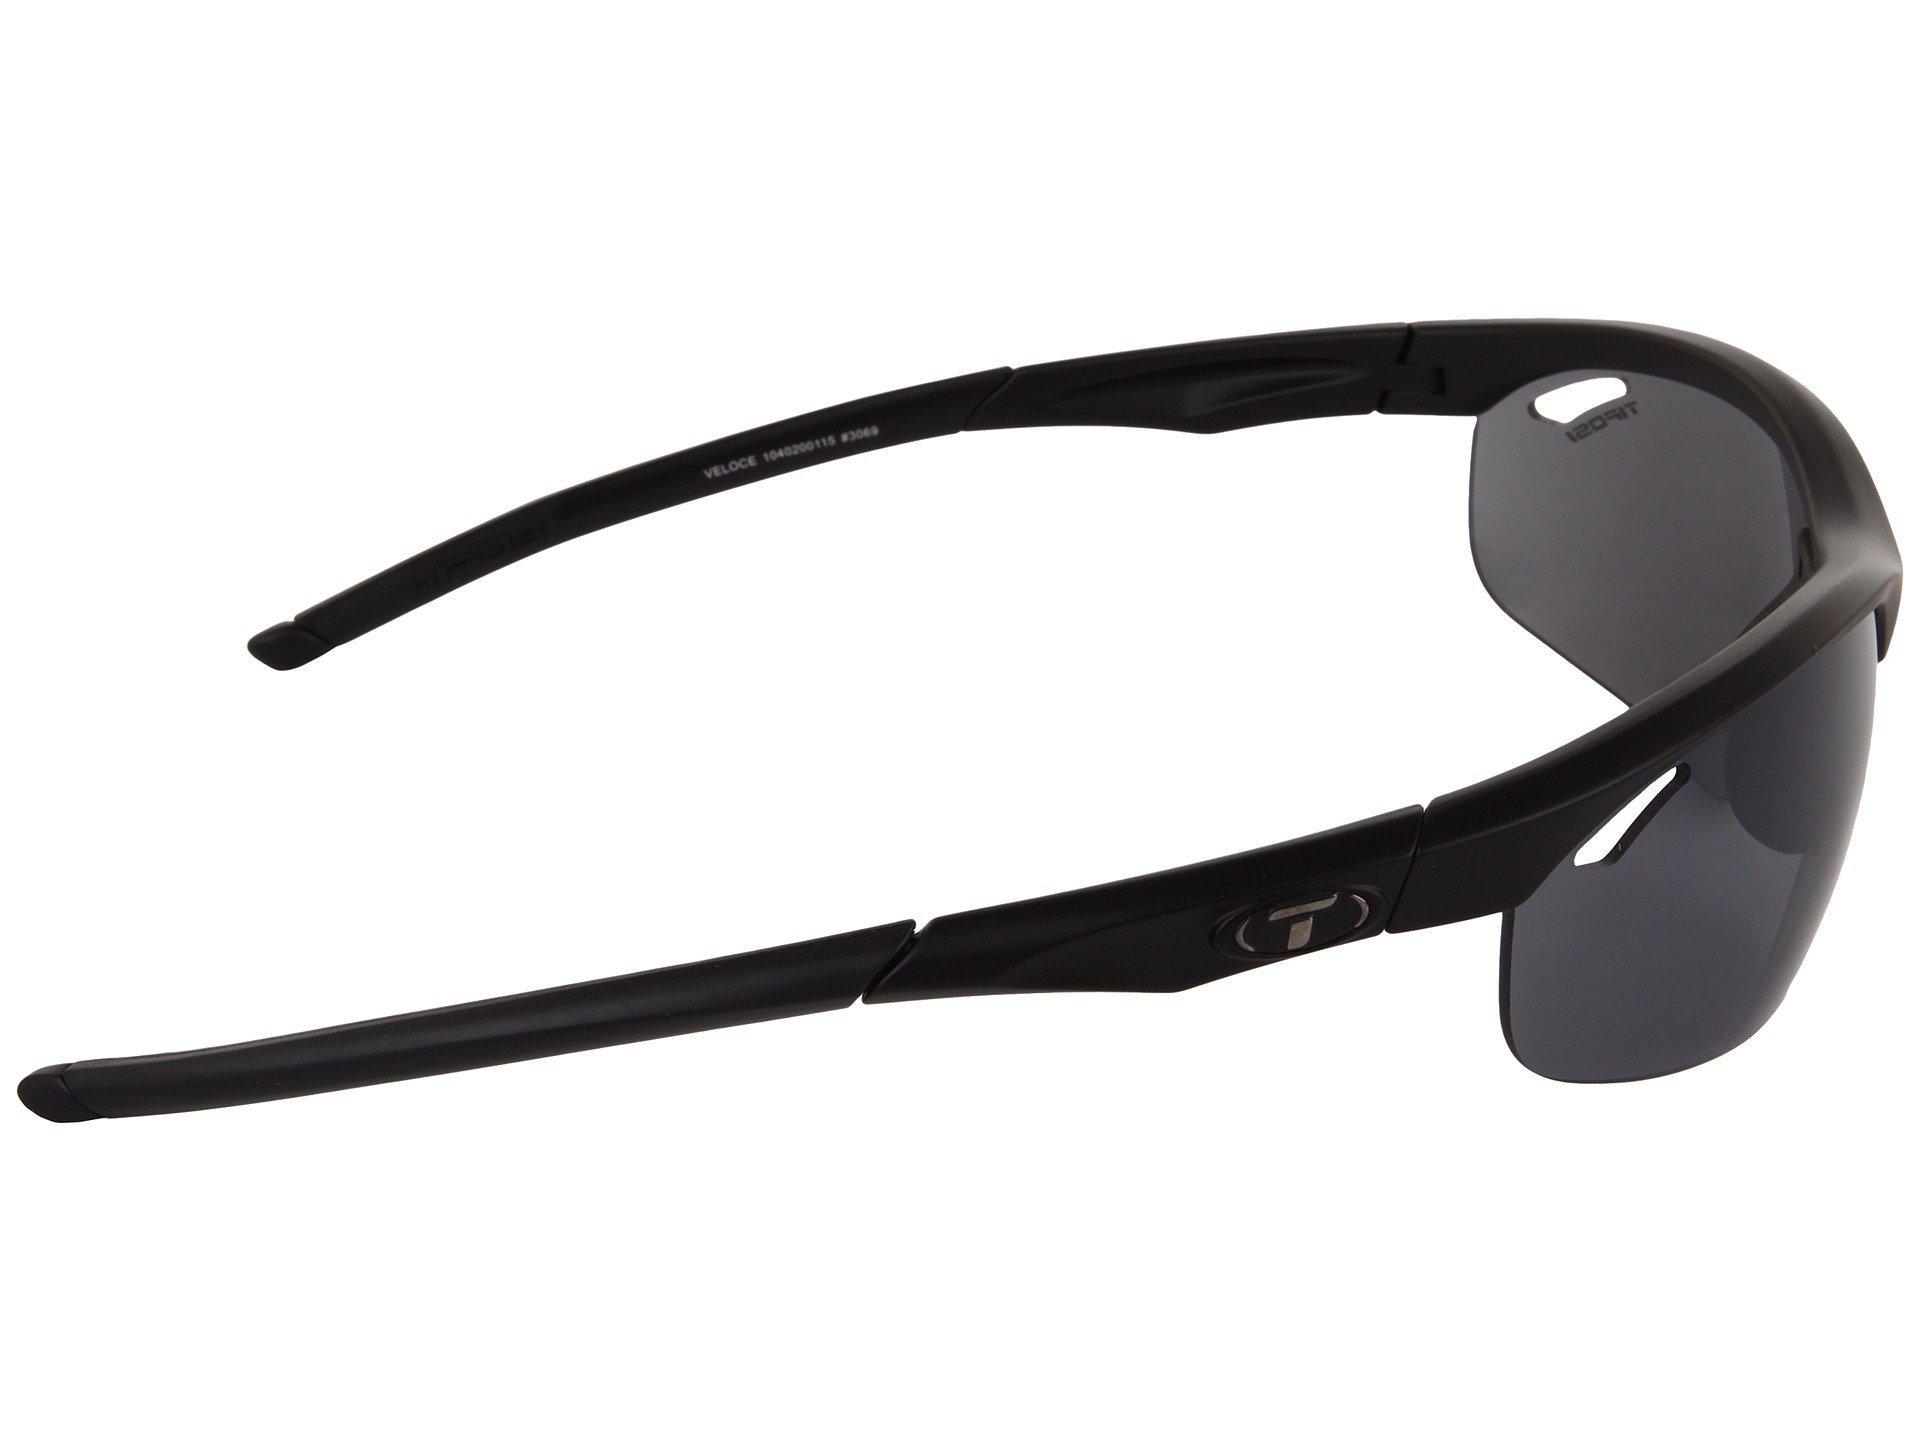 83a6fc60c6 Lyst - Tifosi Optics Velocetm Golf Interchangeable (matte Black ...